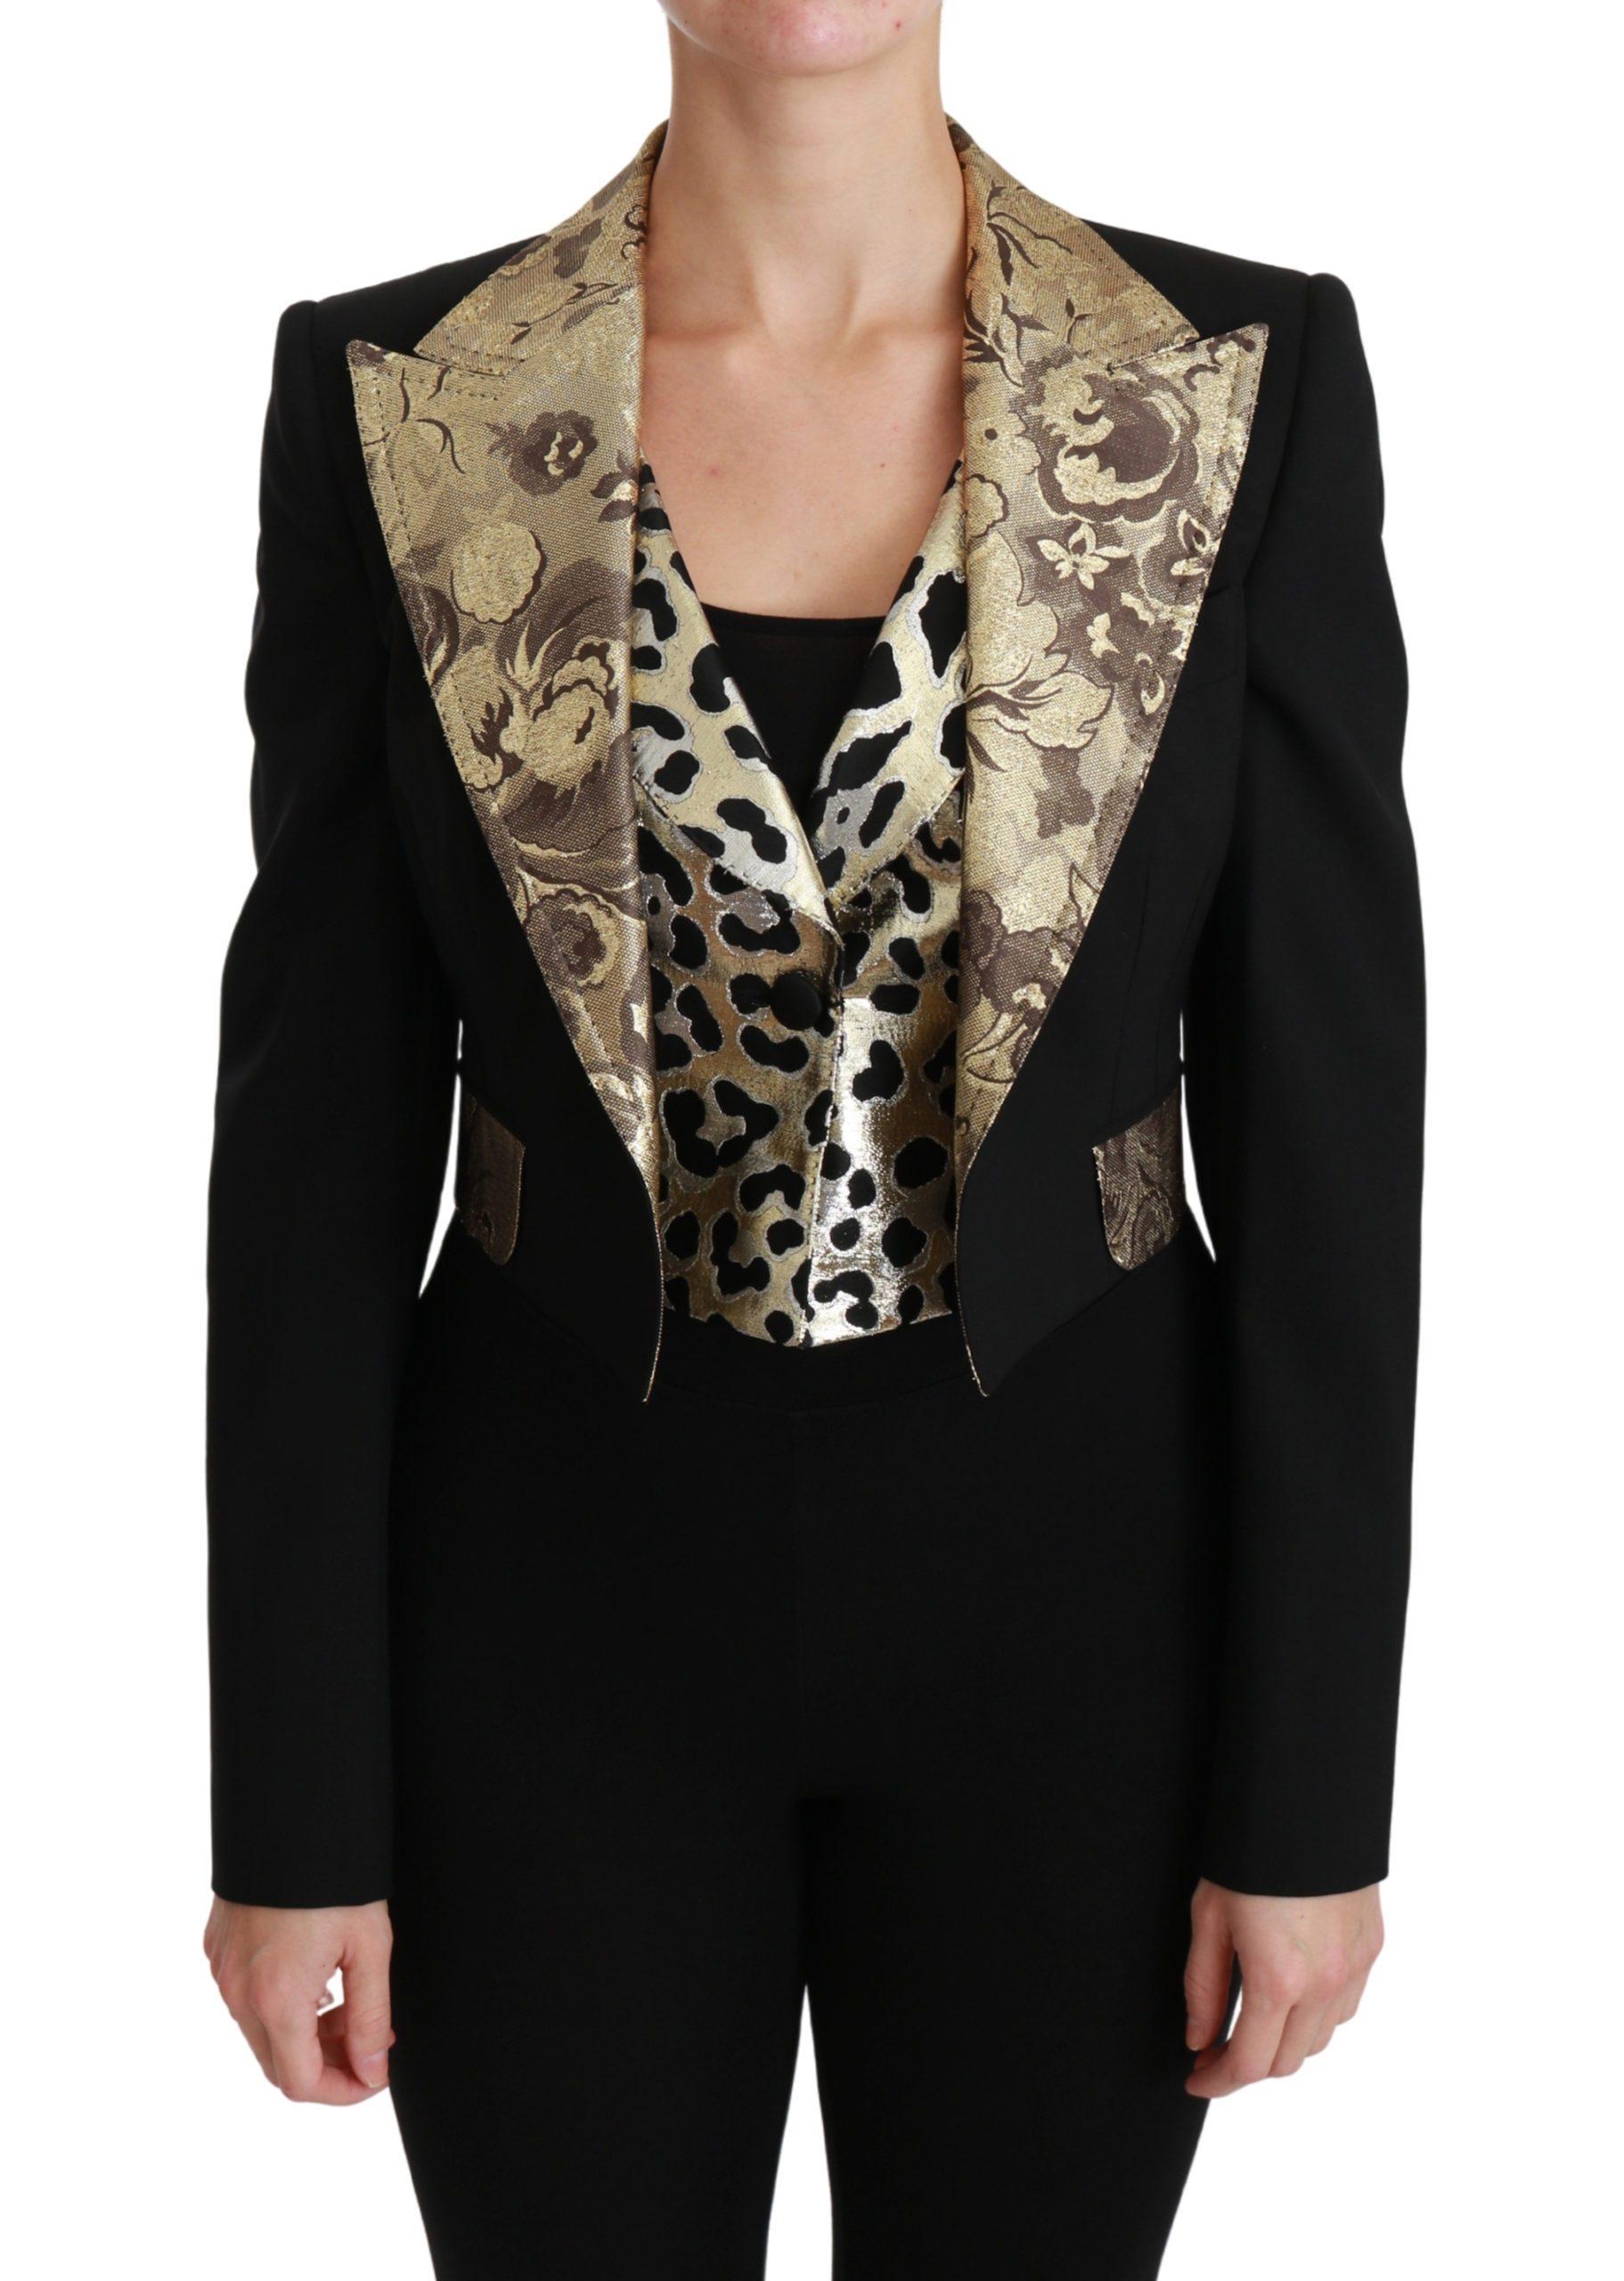 Dolce & Gabbana Women's Jacquard Wool Blazer Black JKT2561 - IT40 S